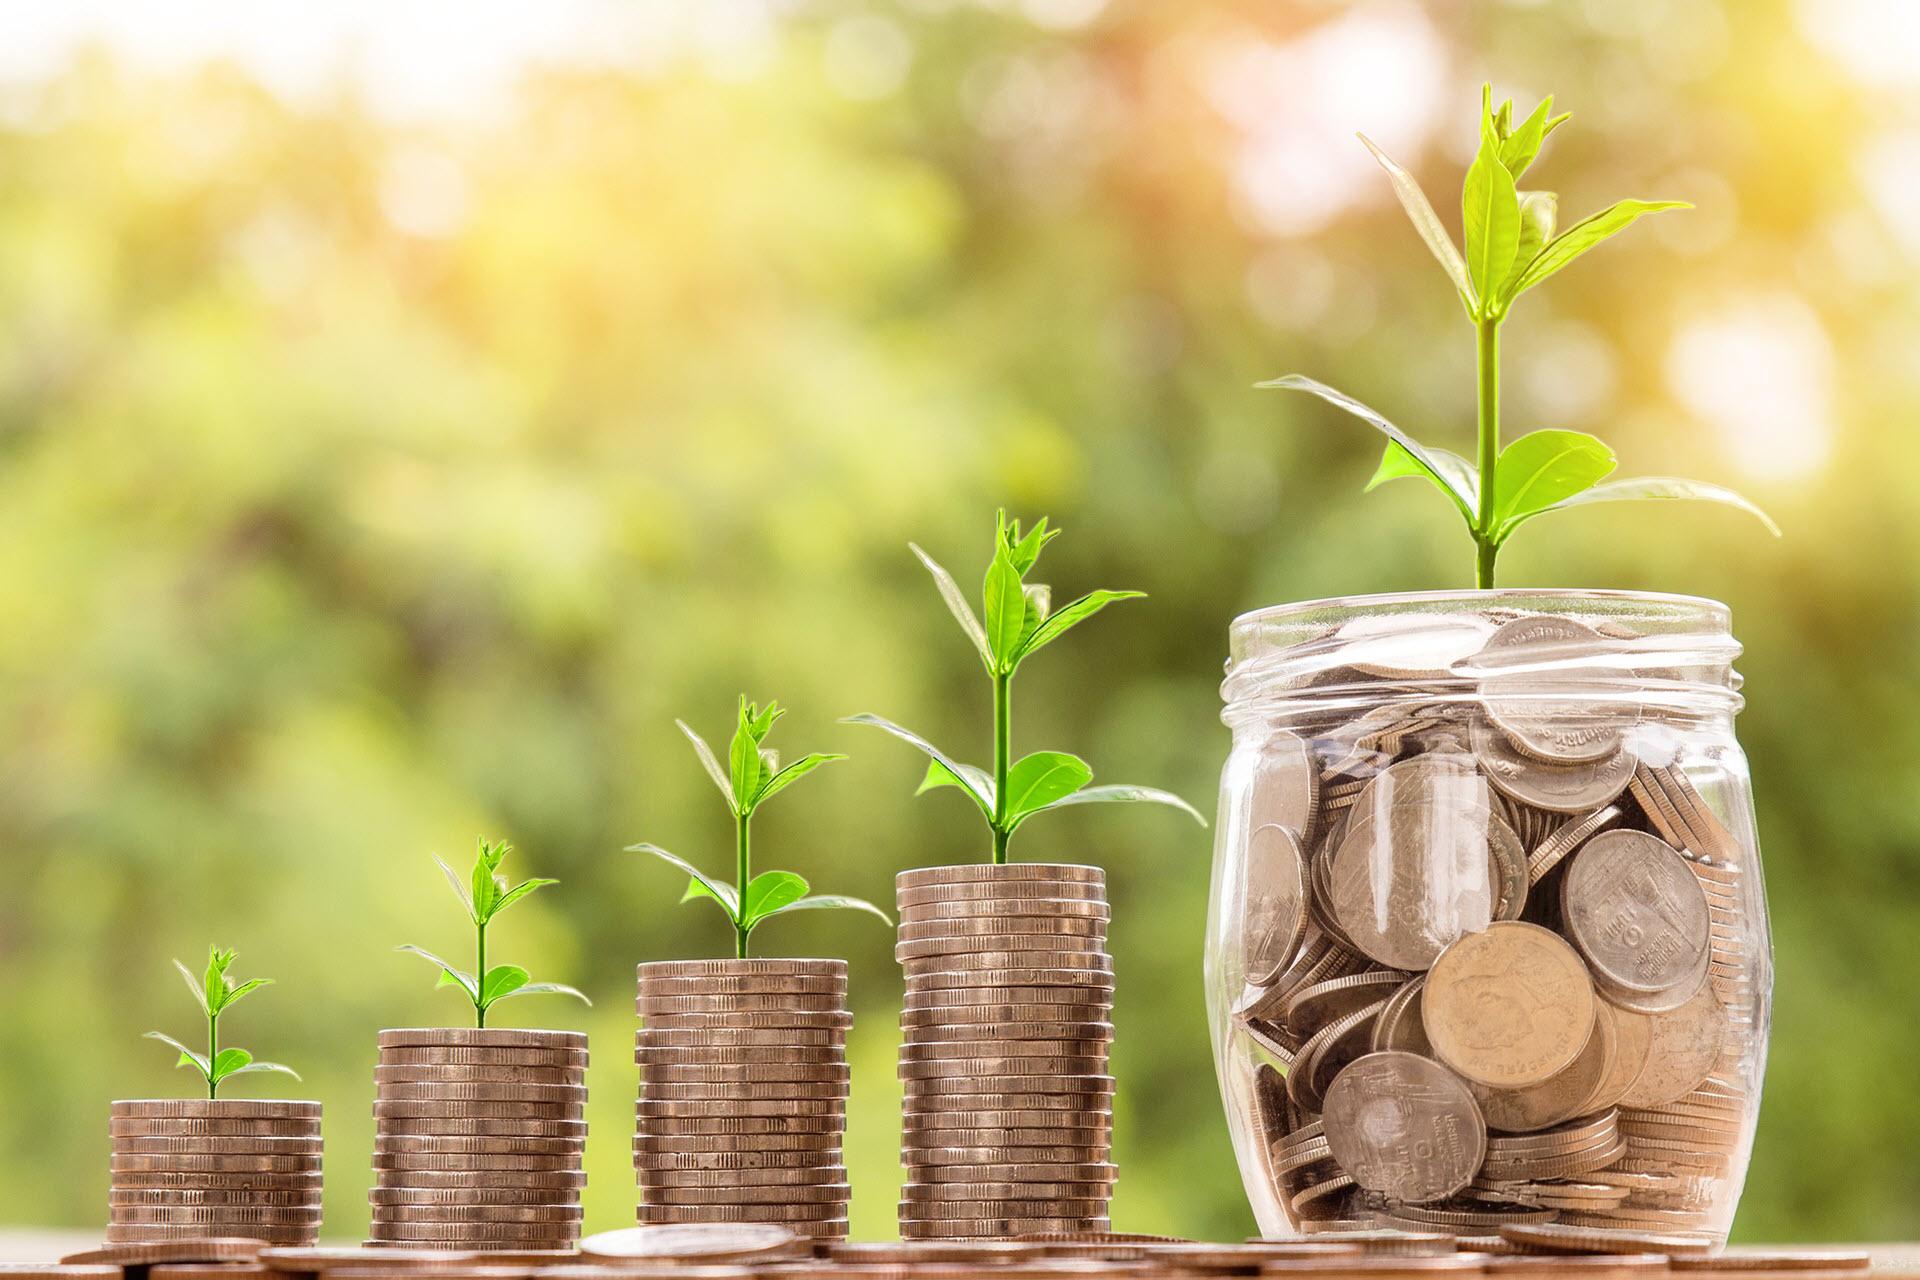 Passives Einkommen generieren – 7 geniale Ideen